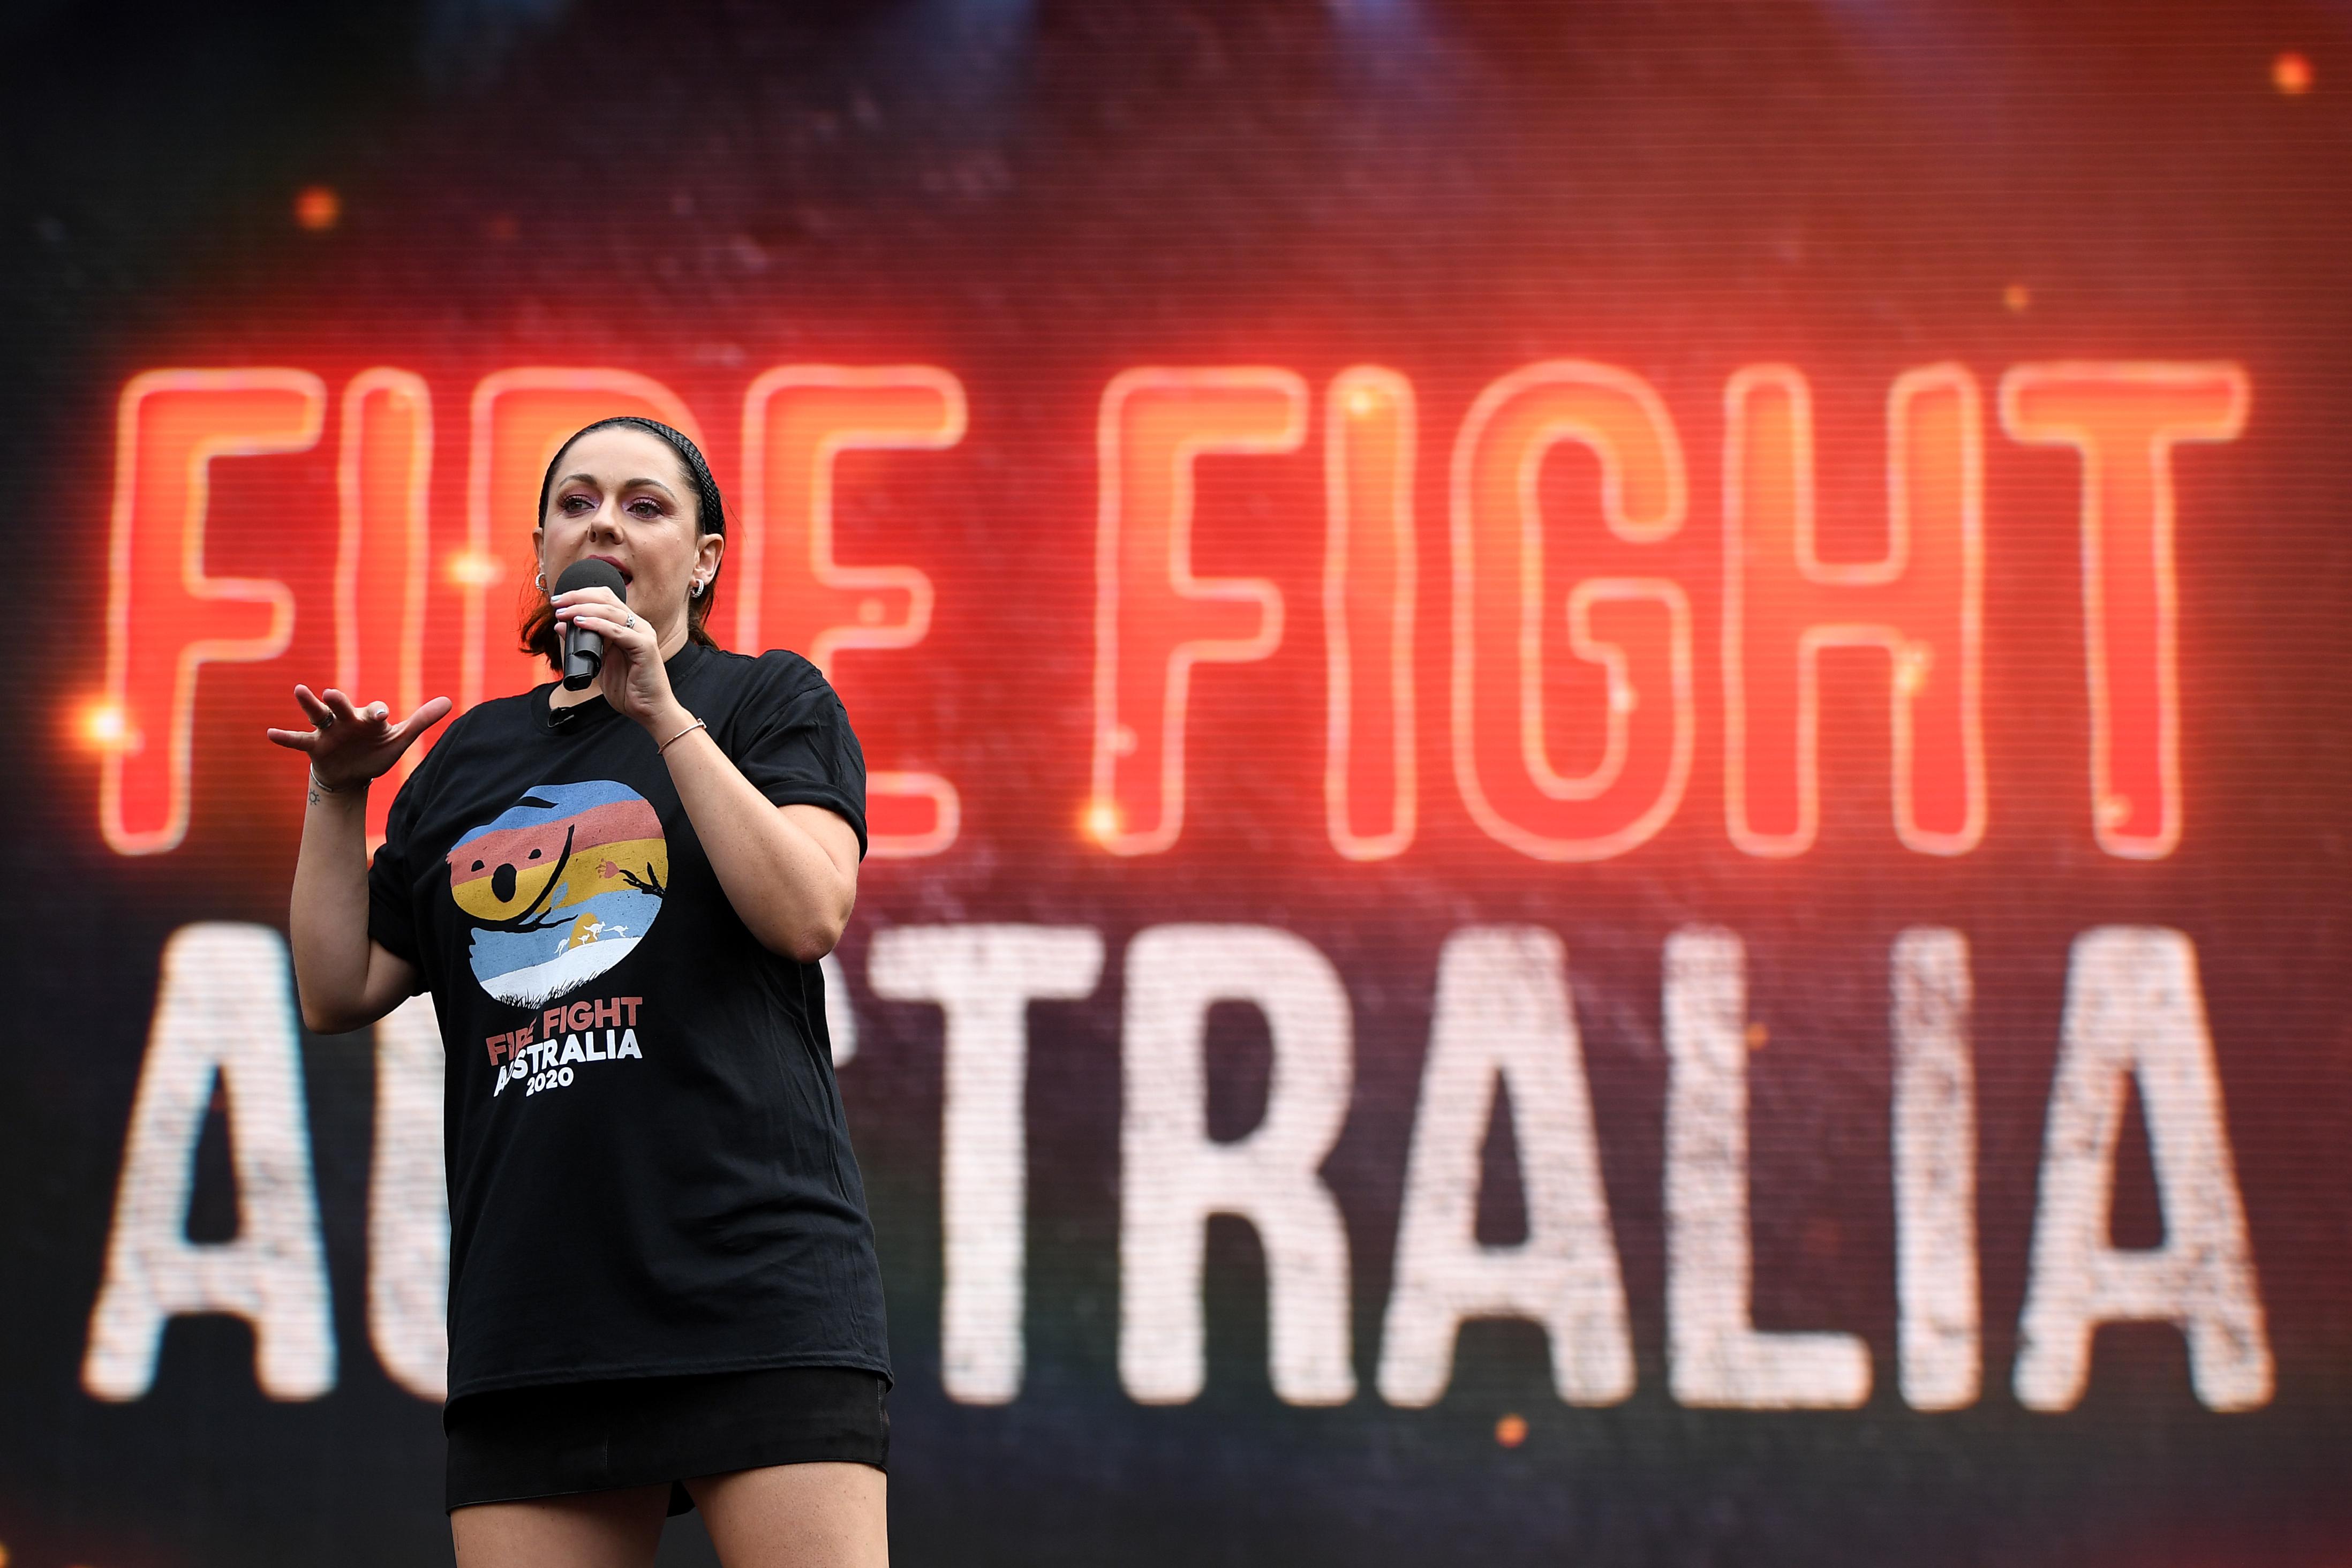 Celeste Barber speaks during the Fire Fight Australia bushfire relief concert at ANZ Stadium in Sydney, Sunday, February 16, 2020. (AAP Image/Joel Carrett)